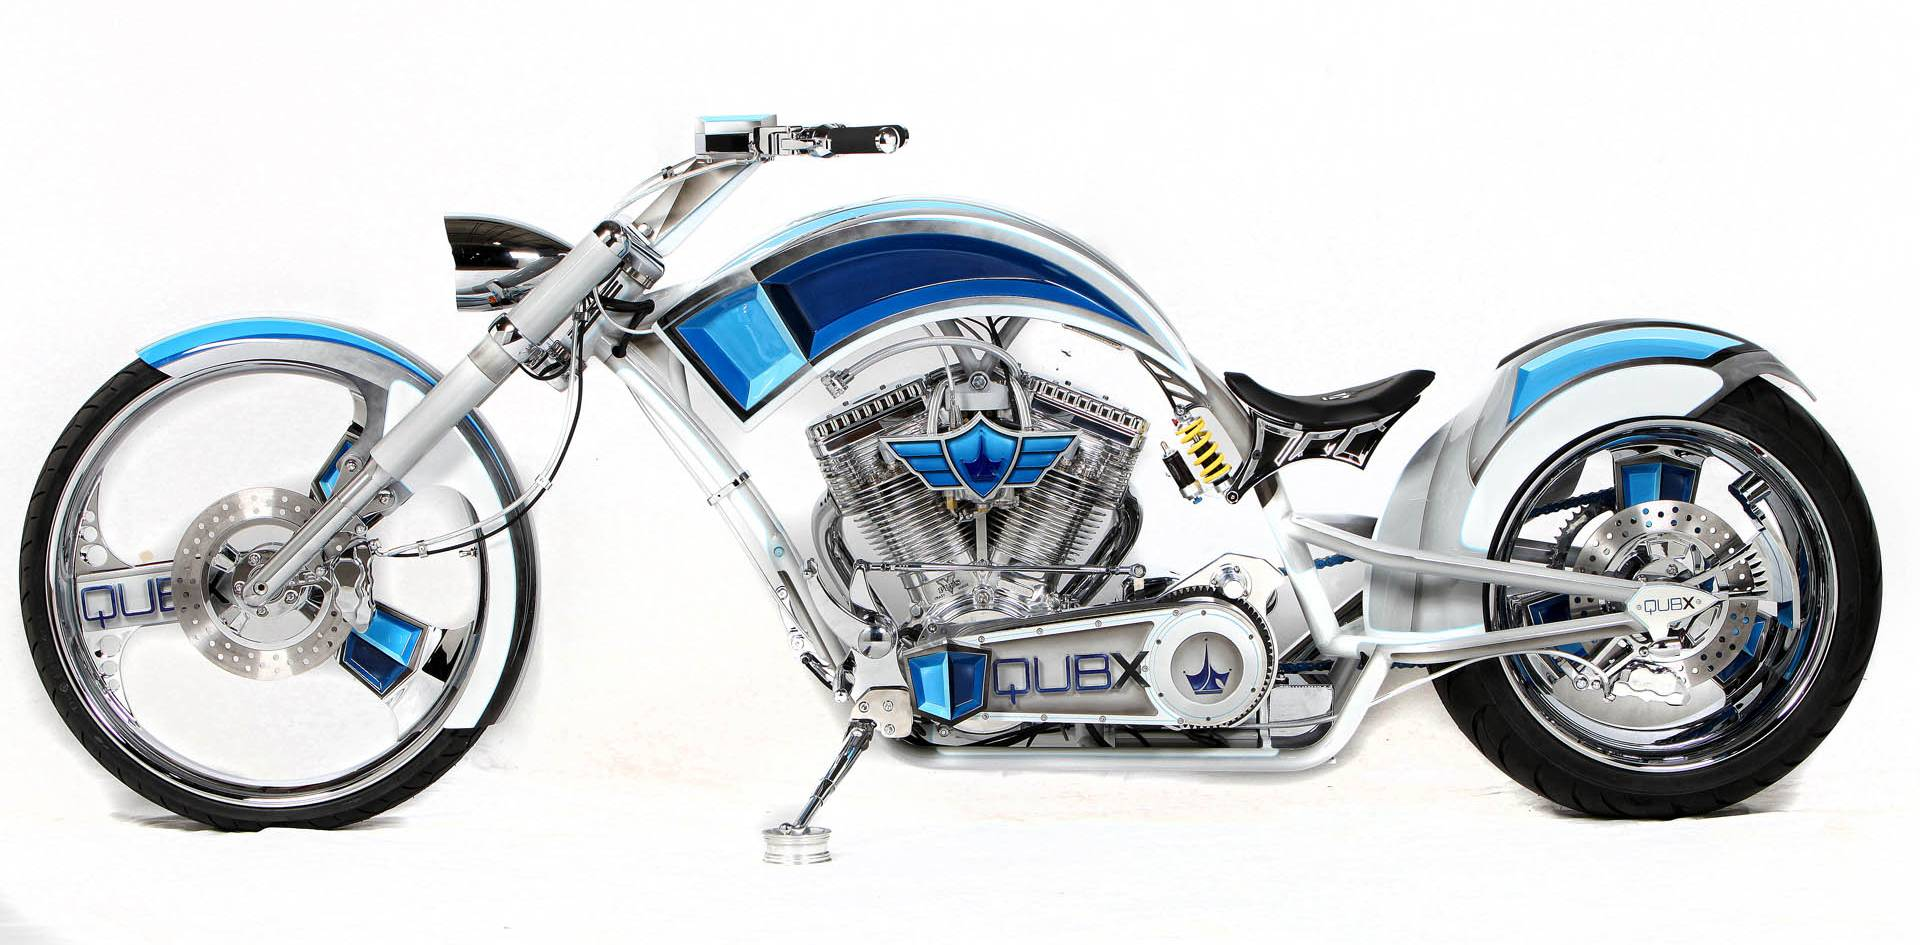 paul-jr-designs-qubx-bike-008